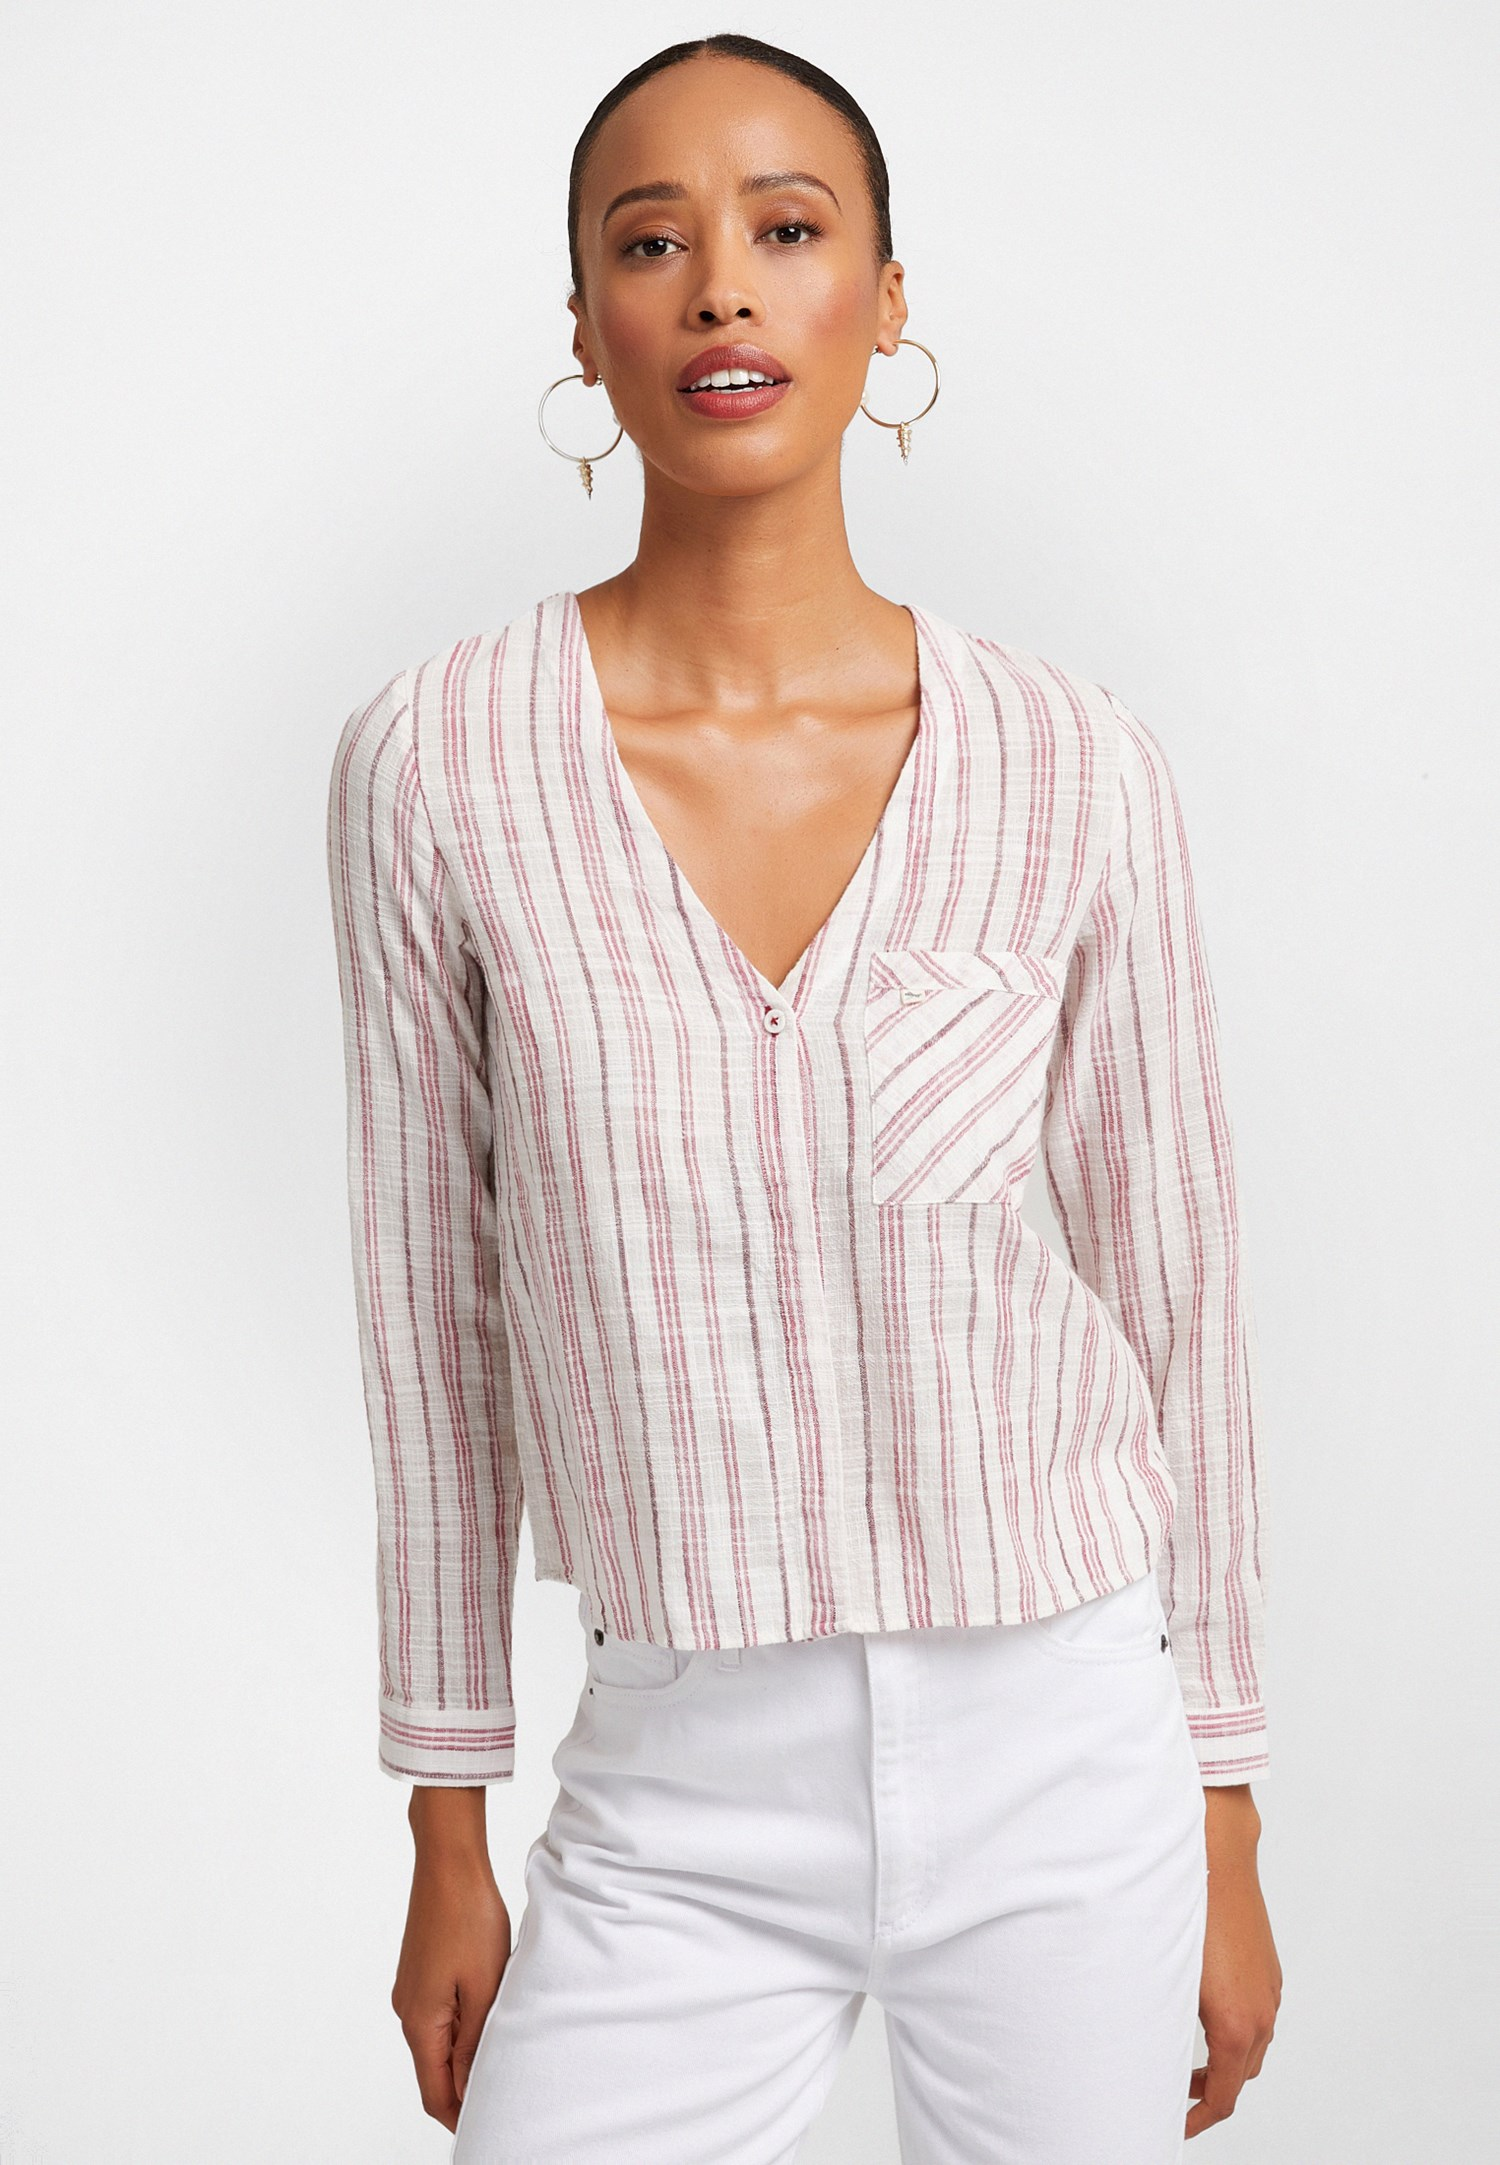 Bayan Çok Renkli V Yaka Çizgili Gömlek